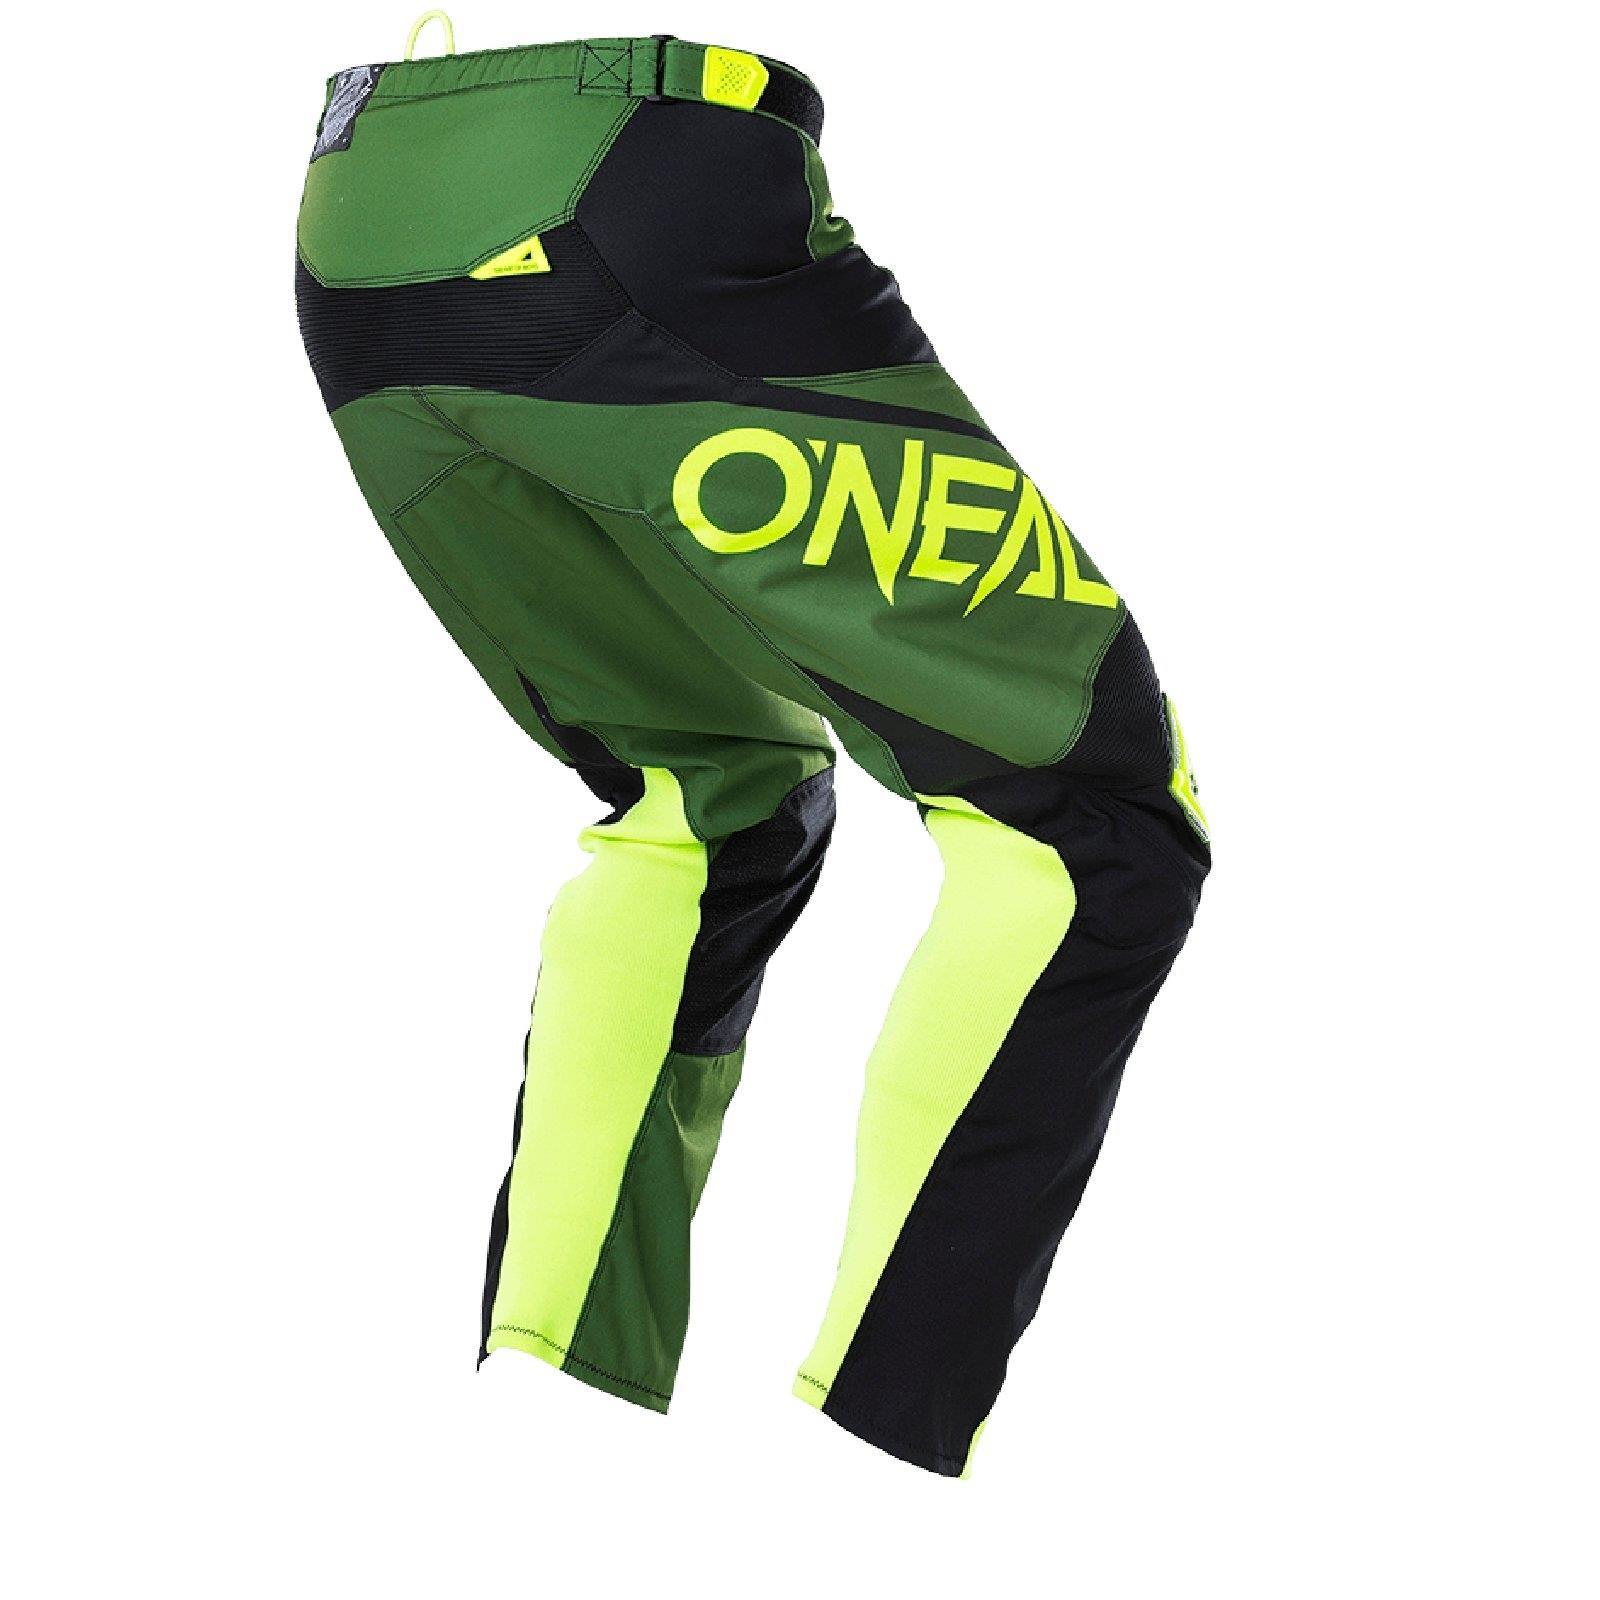 O-039-neal-elemento-Mayhem-Hardwear-Pants-pantalones-MX-Moto-Cross-Enduro-todoterreno-cuero miniatura 34